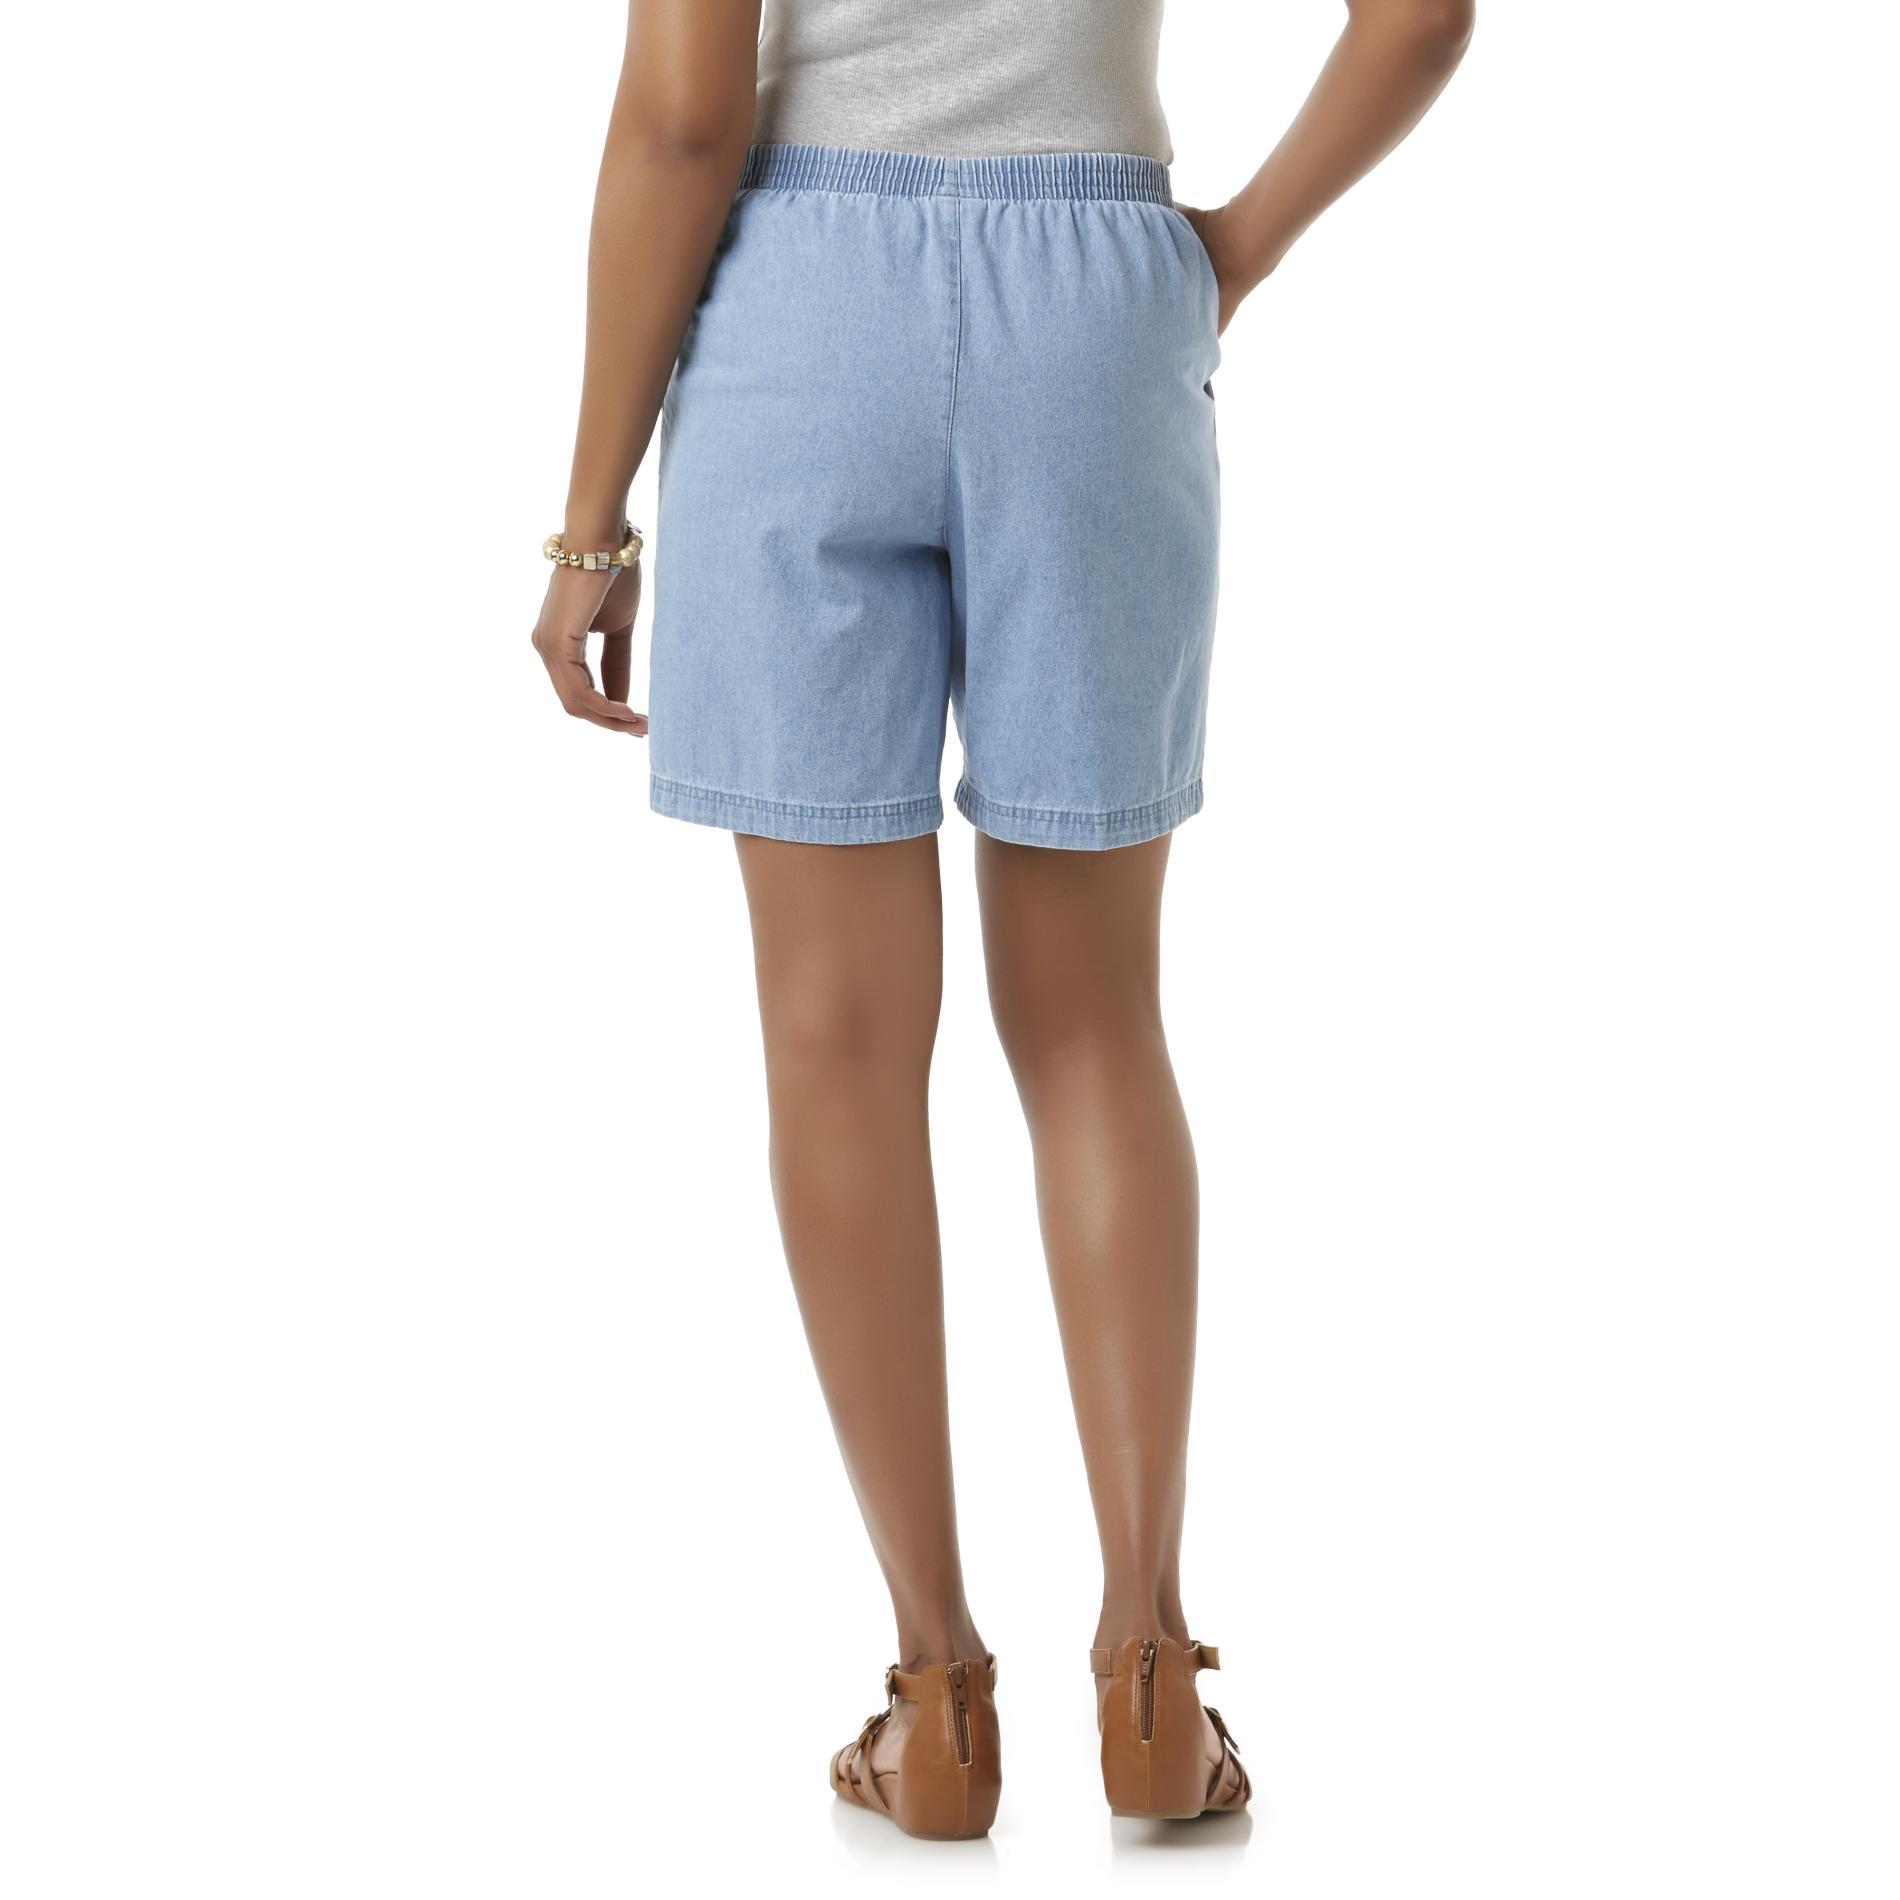 Basic Editions Women's Twill Shorts